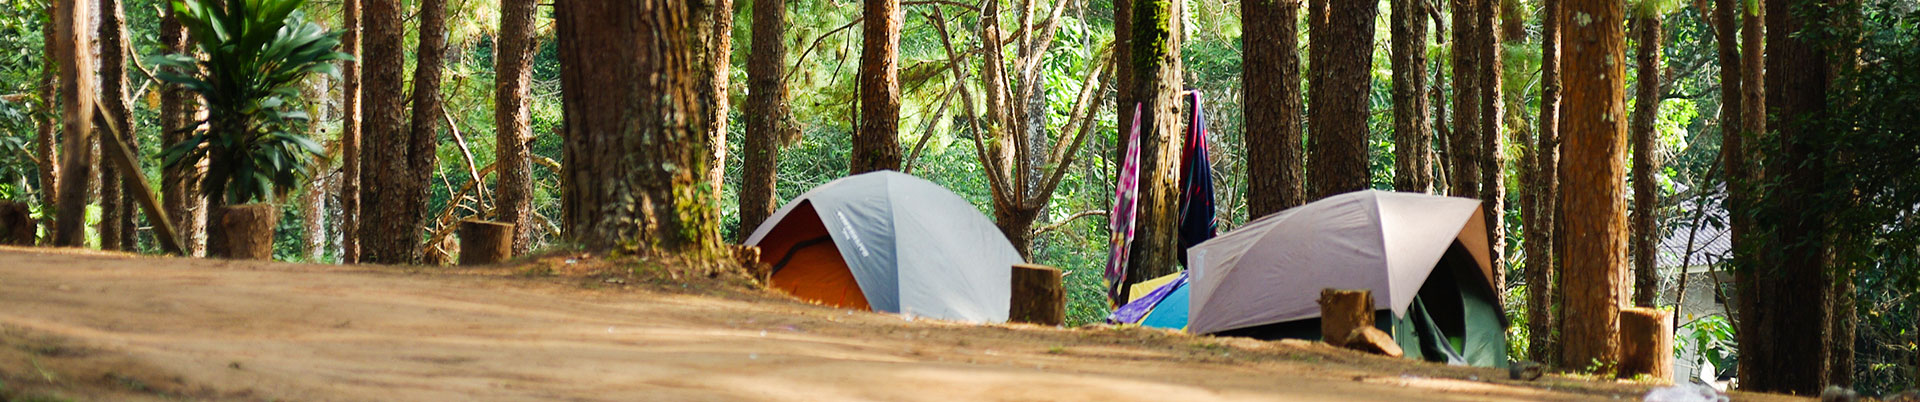 Campground Management Software